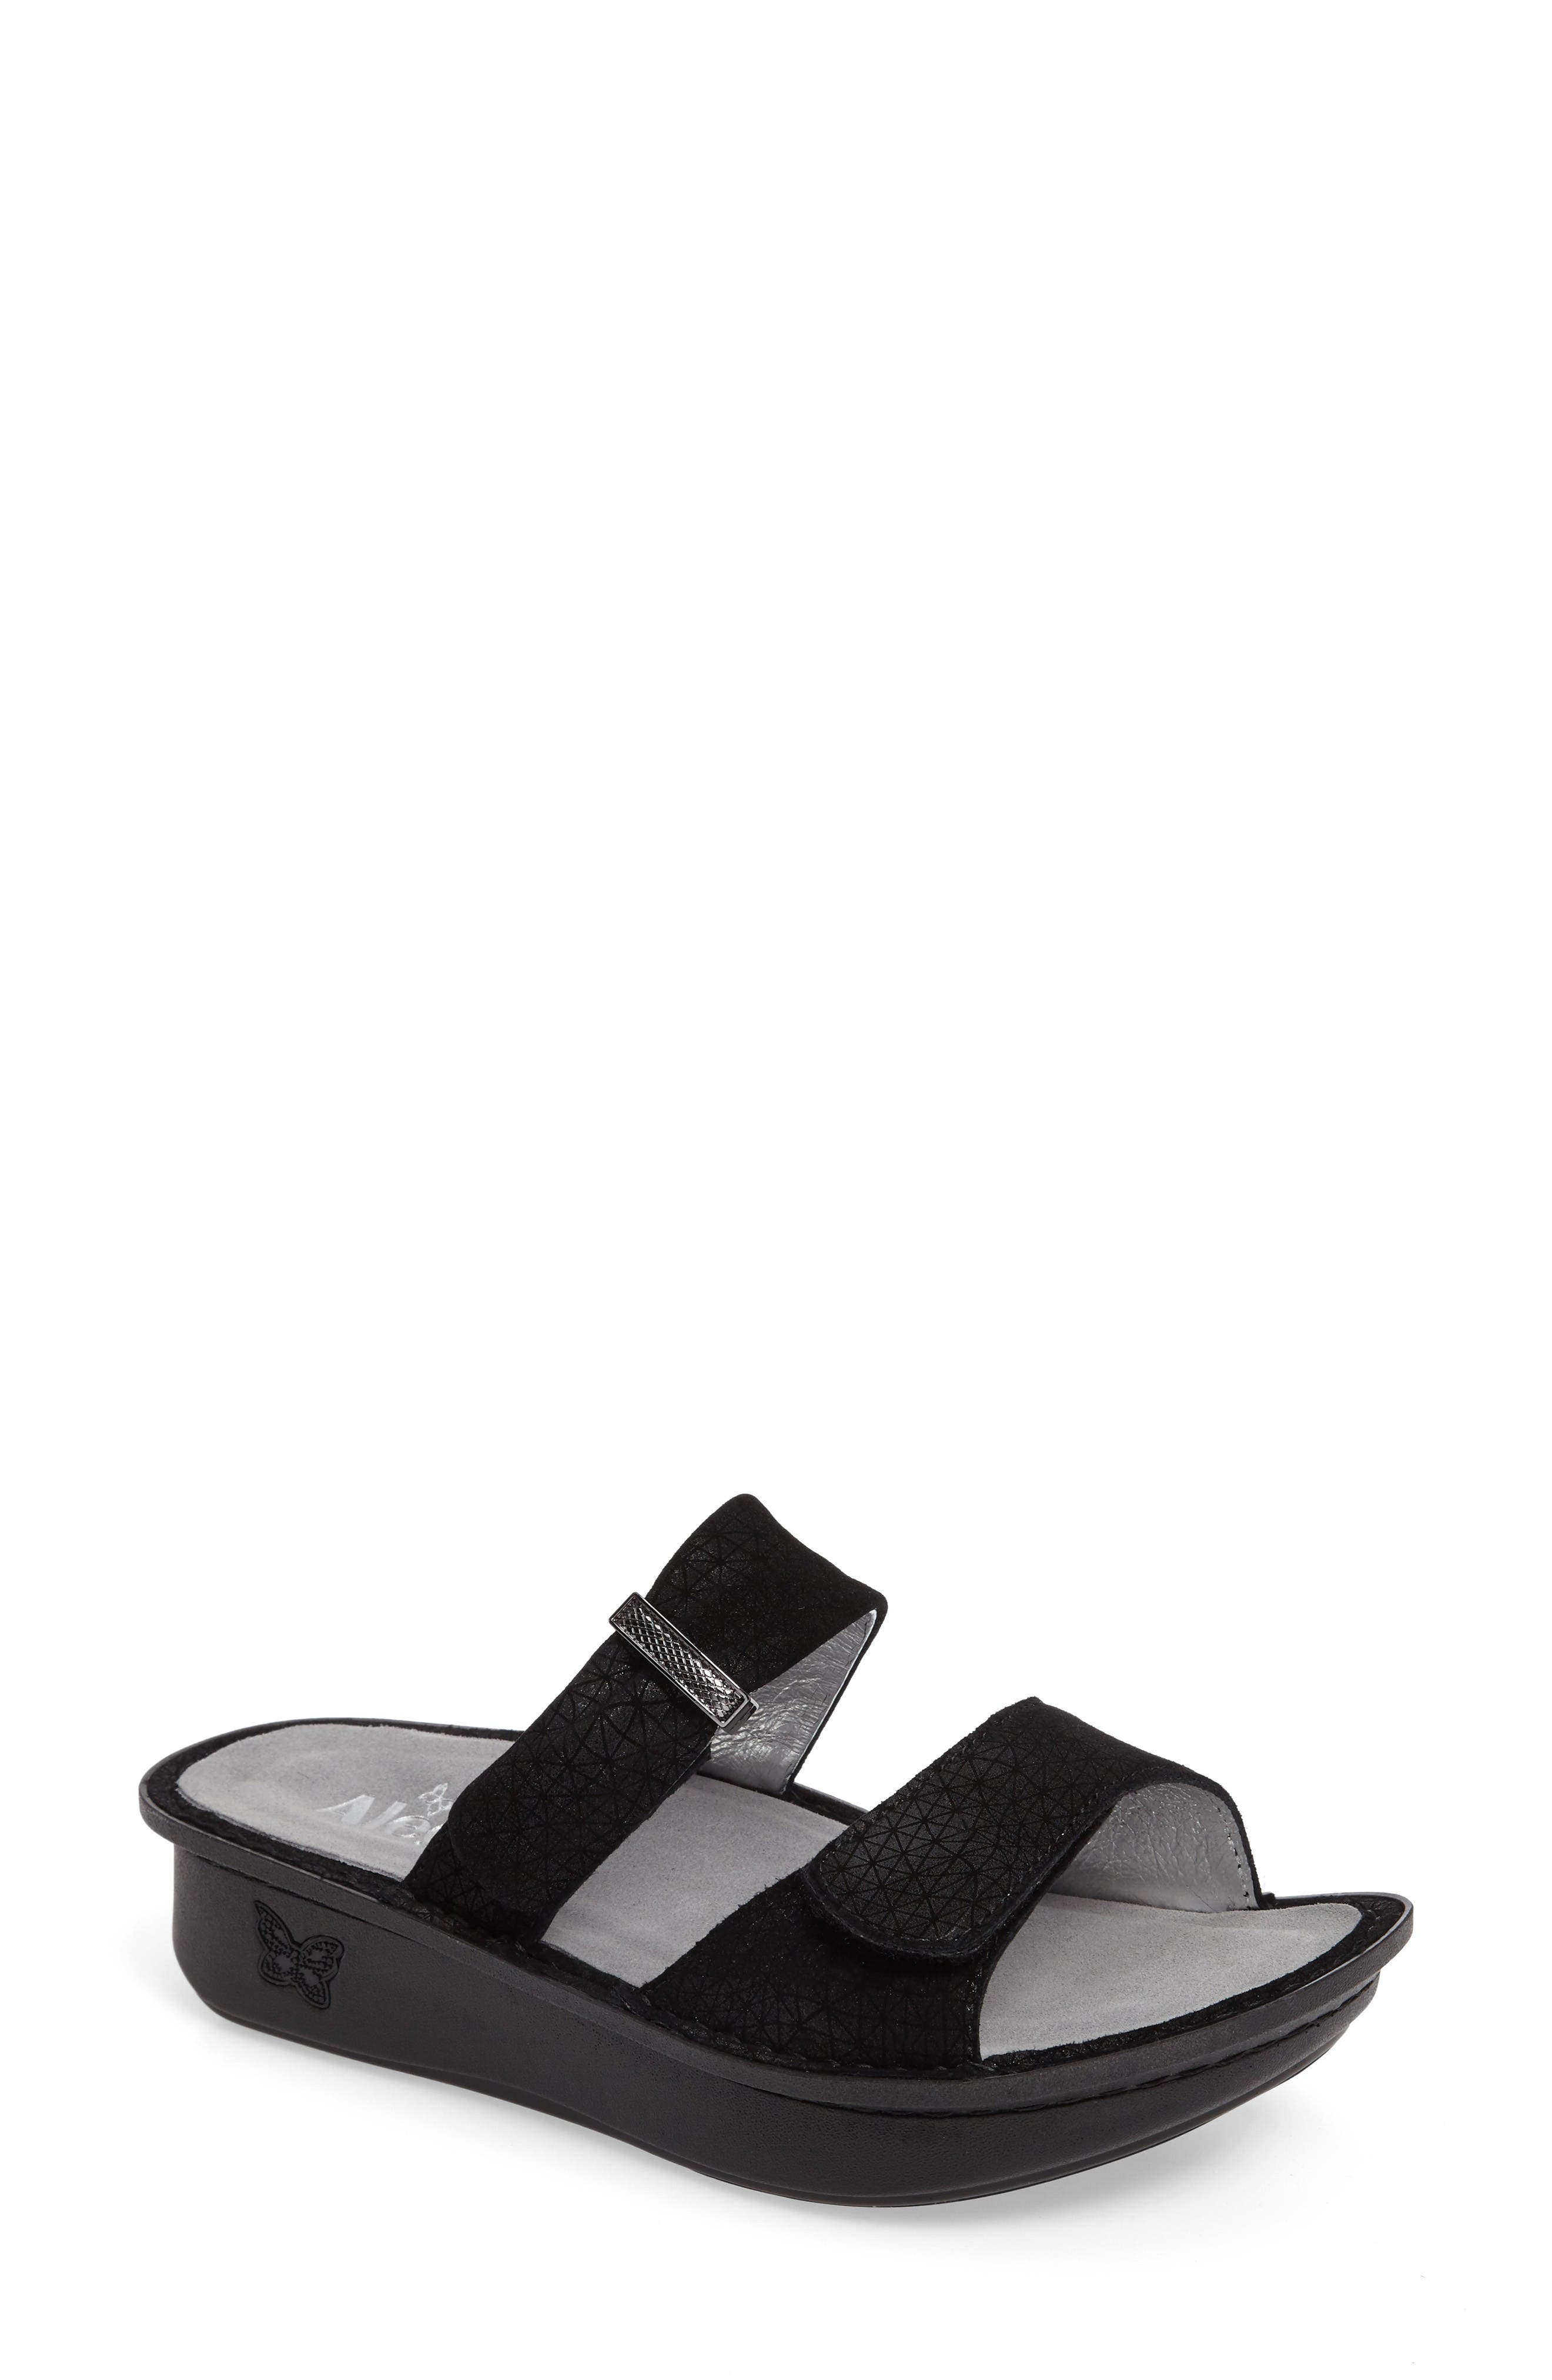 Alternate Image 1 Selected - Alegria 'Karmen' Sandal